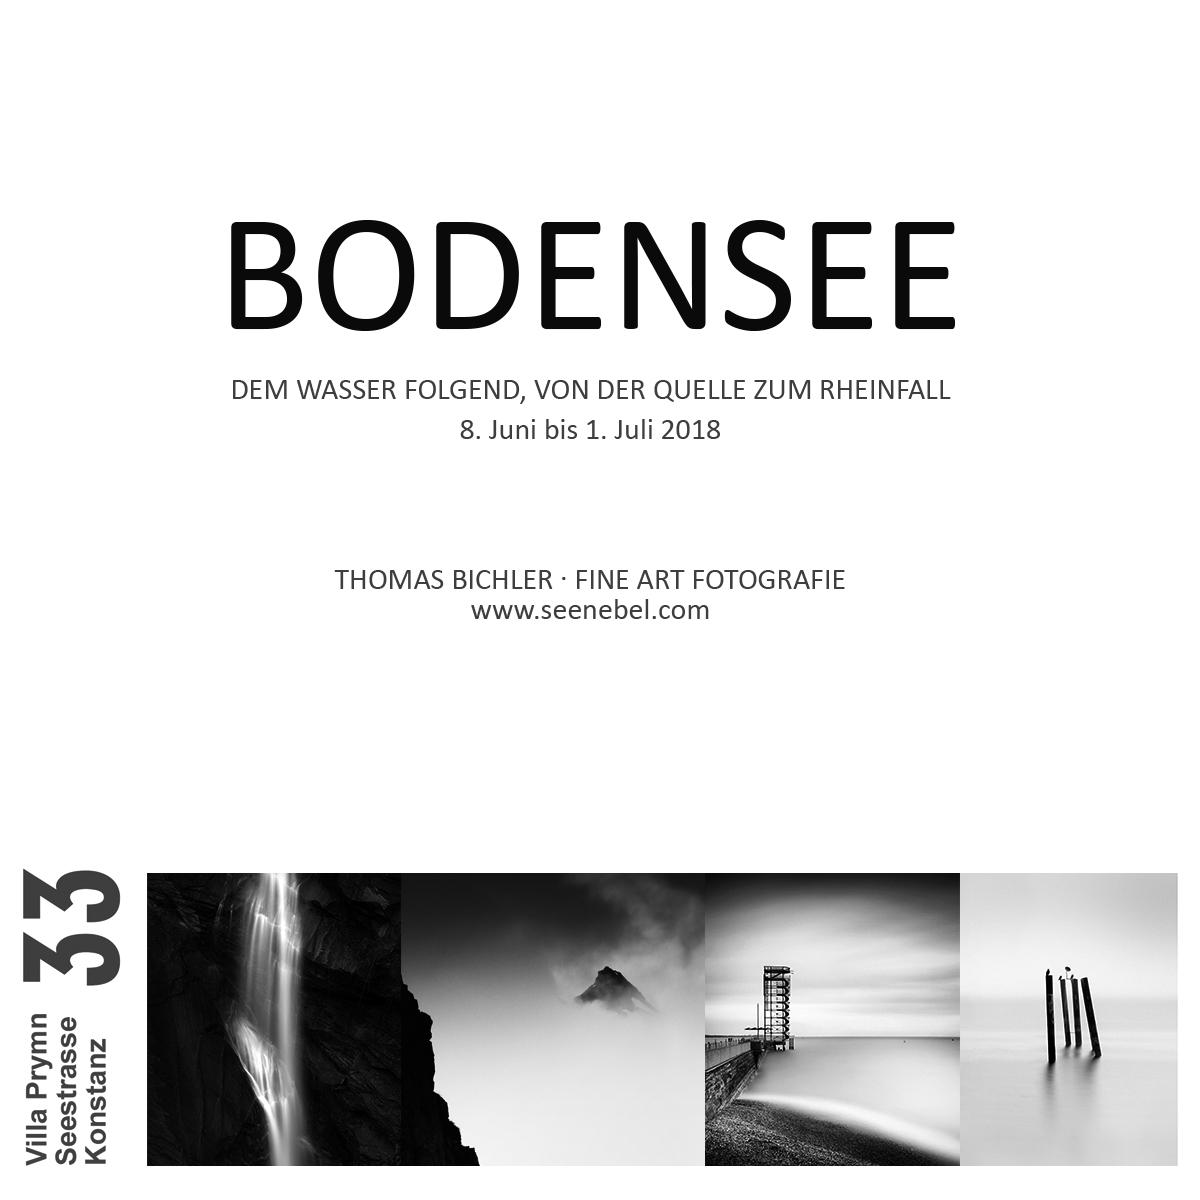 Exhibition June 2018